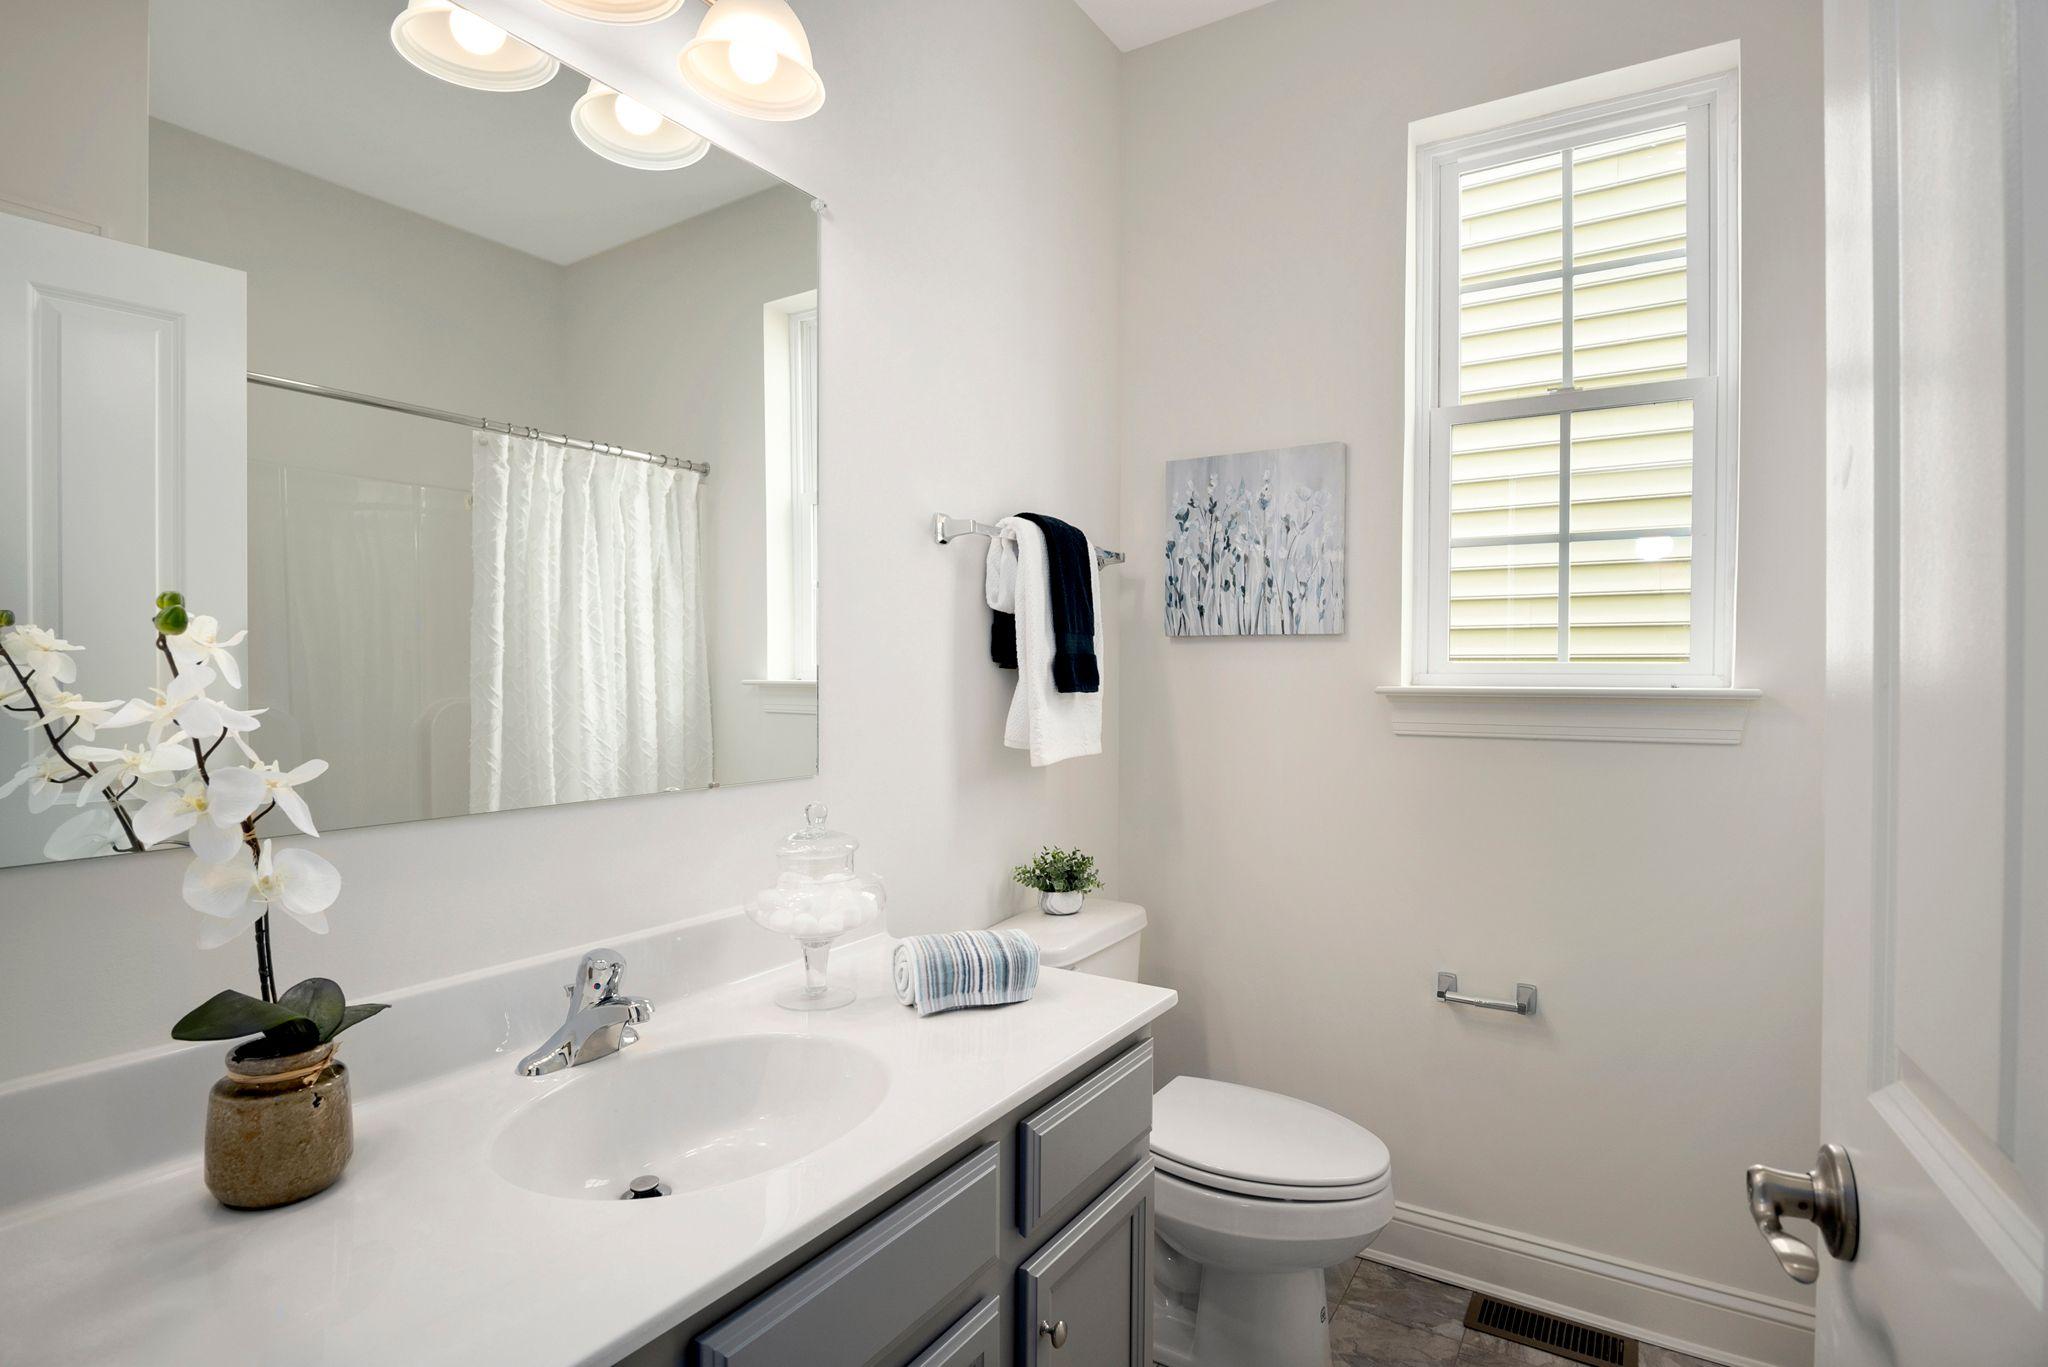 Bathroom featured in The Aston By Benchmark Builders in Dover, DE